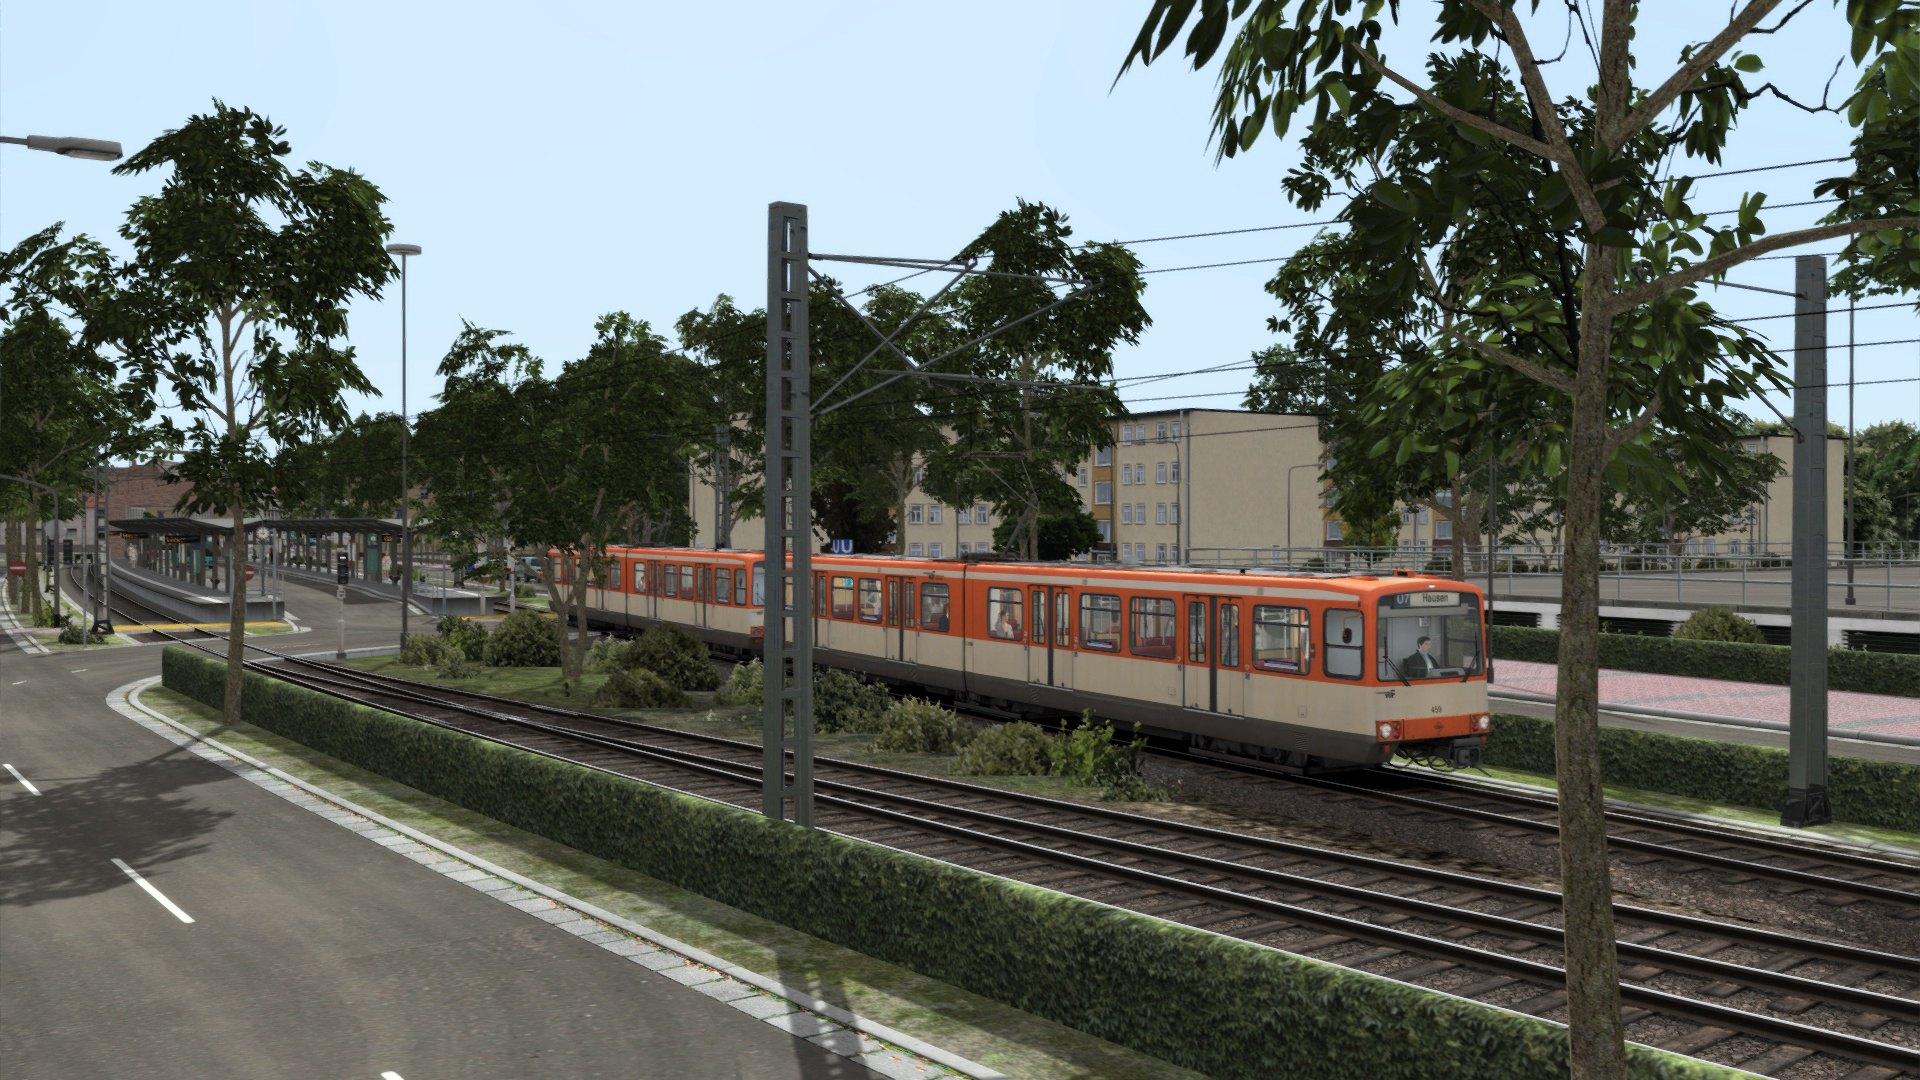 U Bahn Simulator Frankfurt